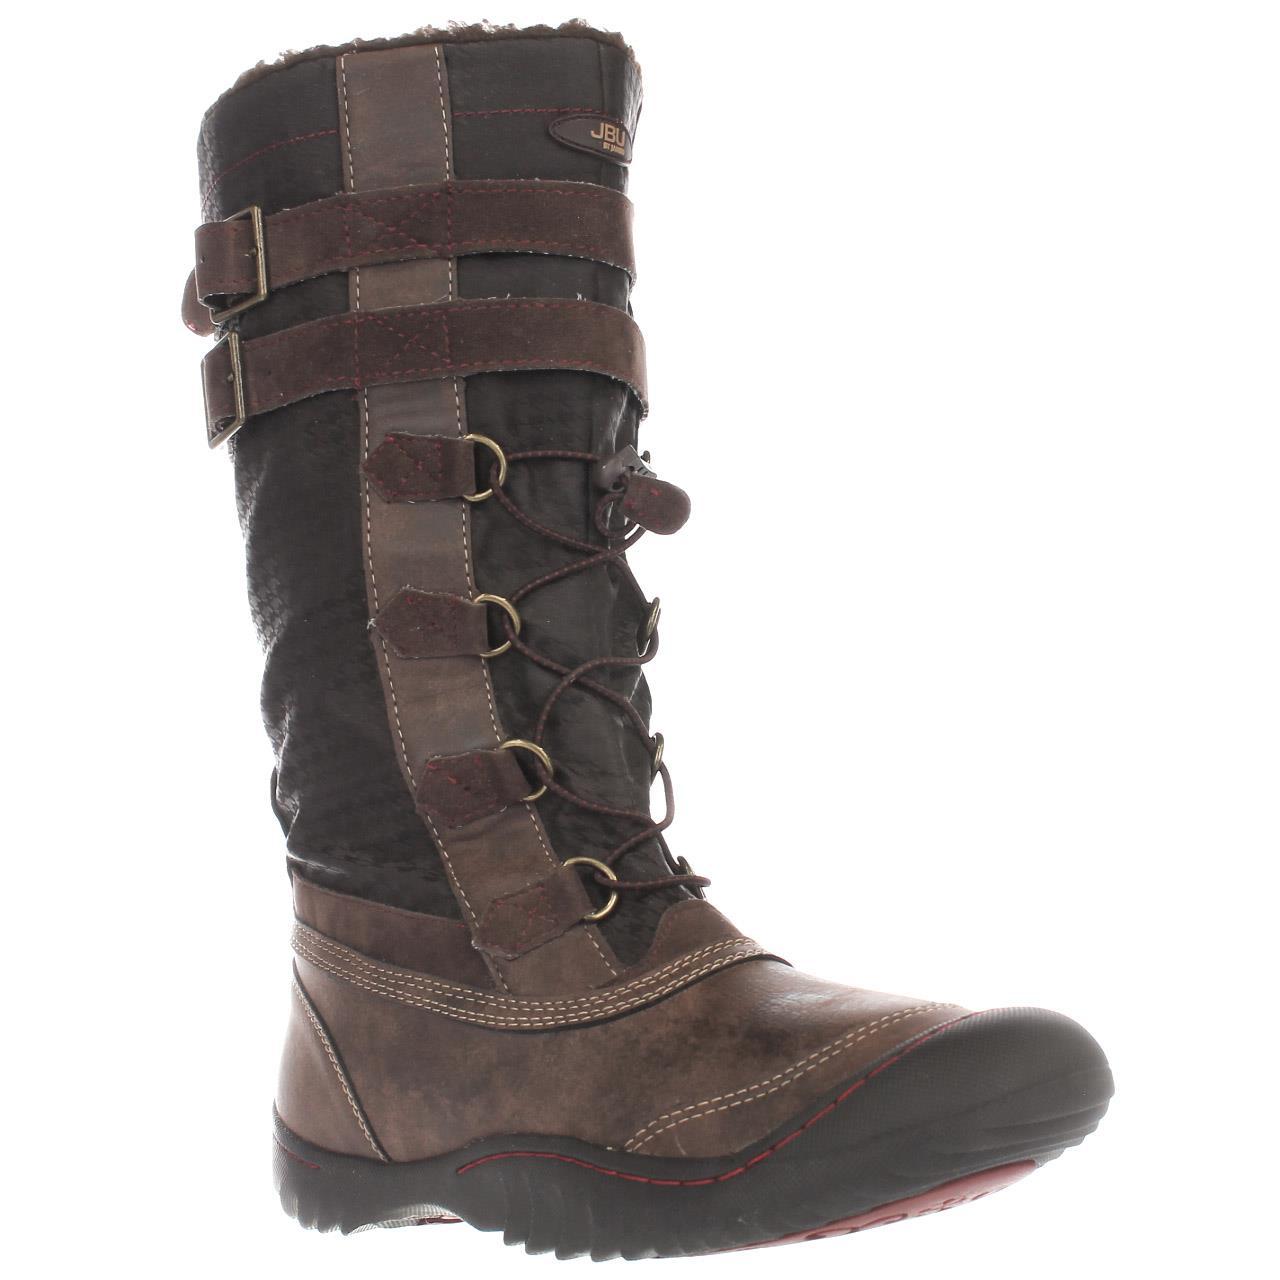 Womens JBU by Jambu Whitney Knee High Snow Boots, Brown